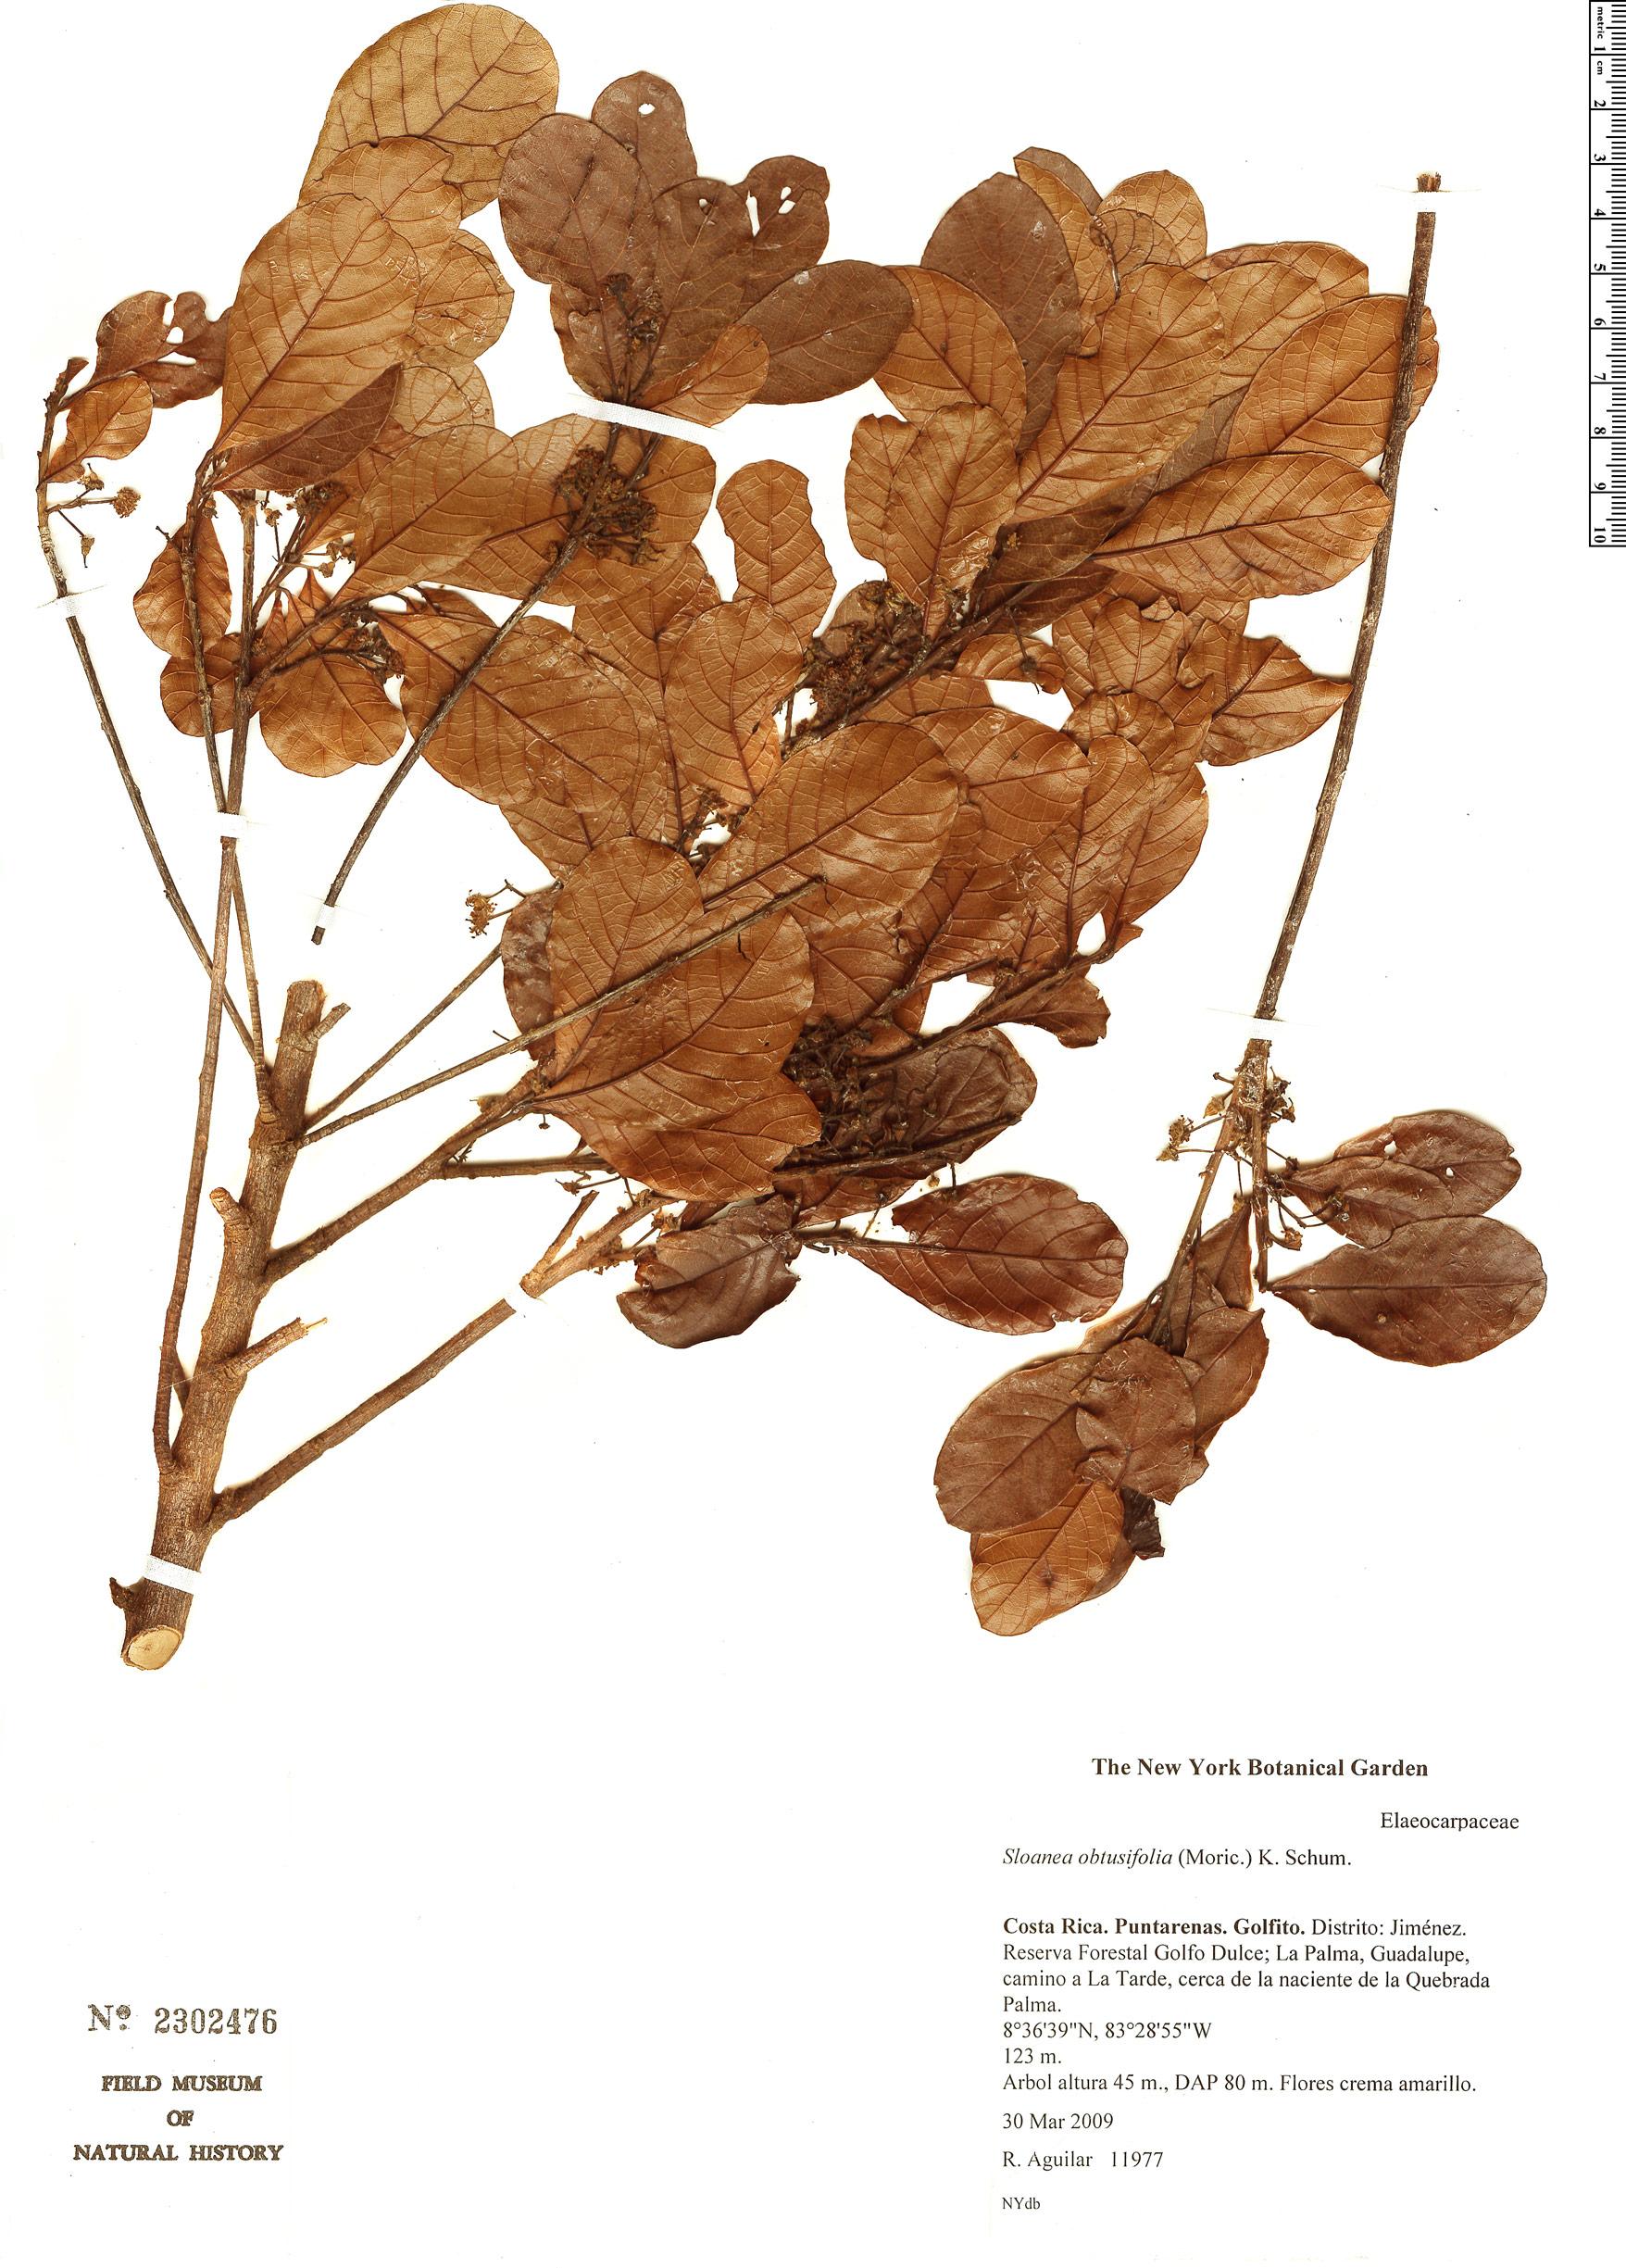 Specimen: Sloanea obtusifolia